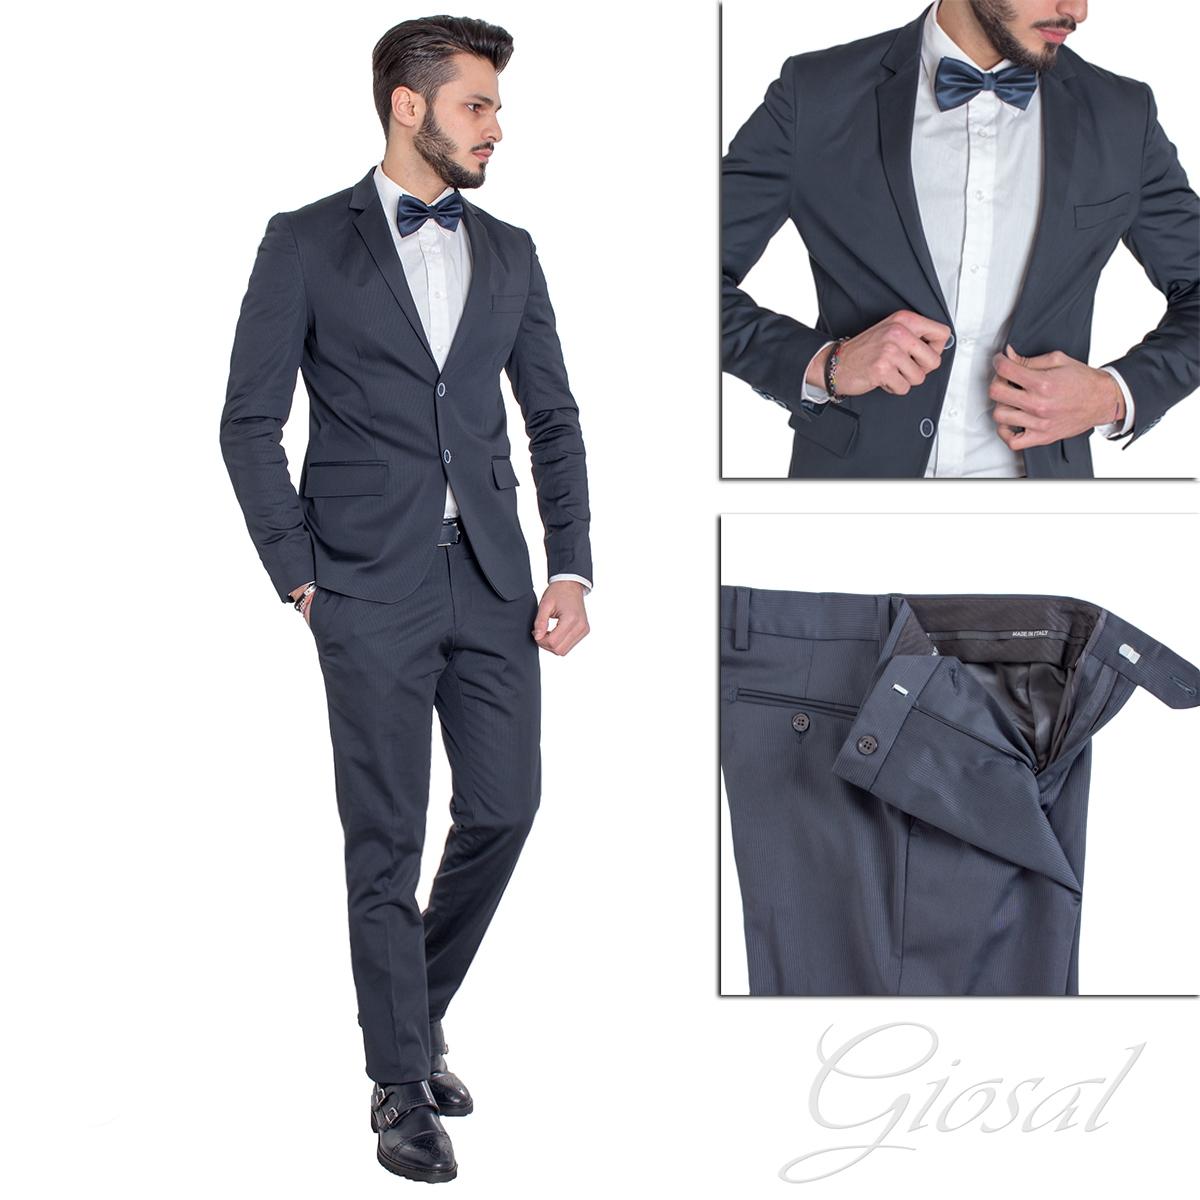 Abiti Eleganti Blu.Abito Elegante Uomo Vestito Giacca Pantalone Blu Tinta Unita Giosal